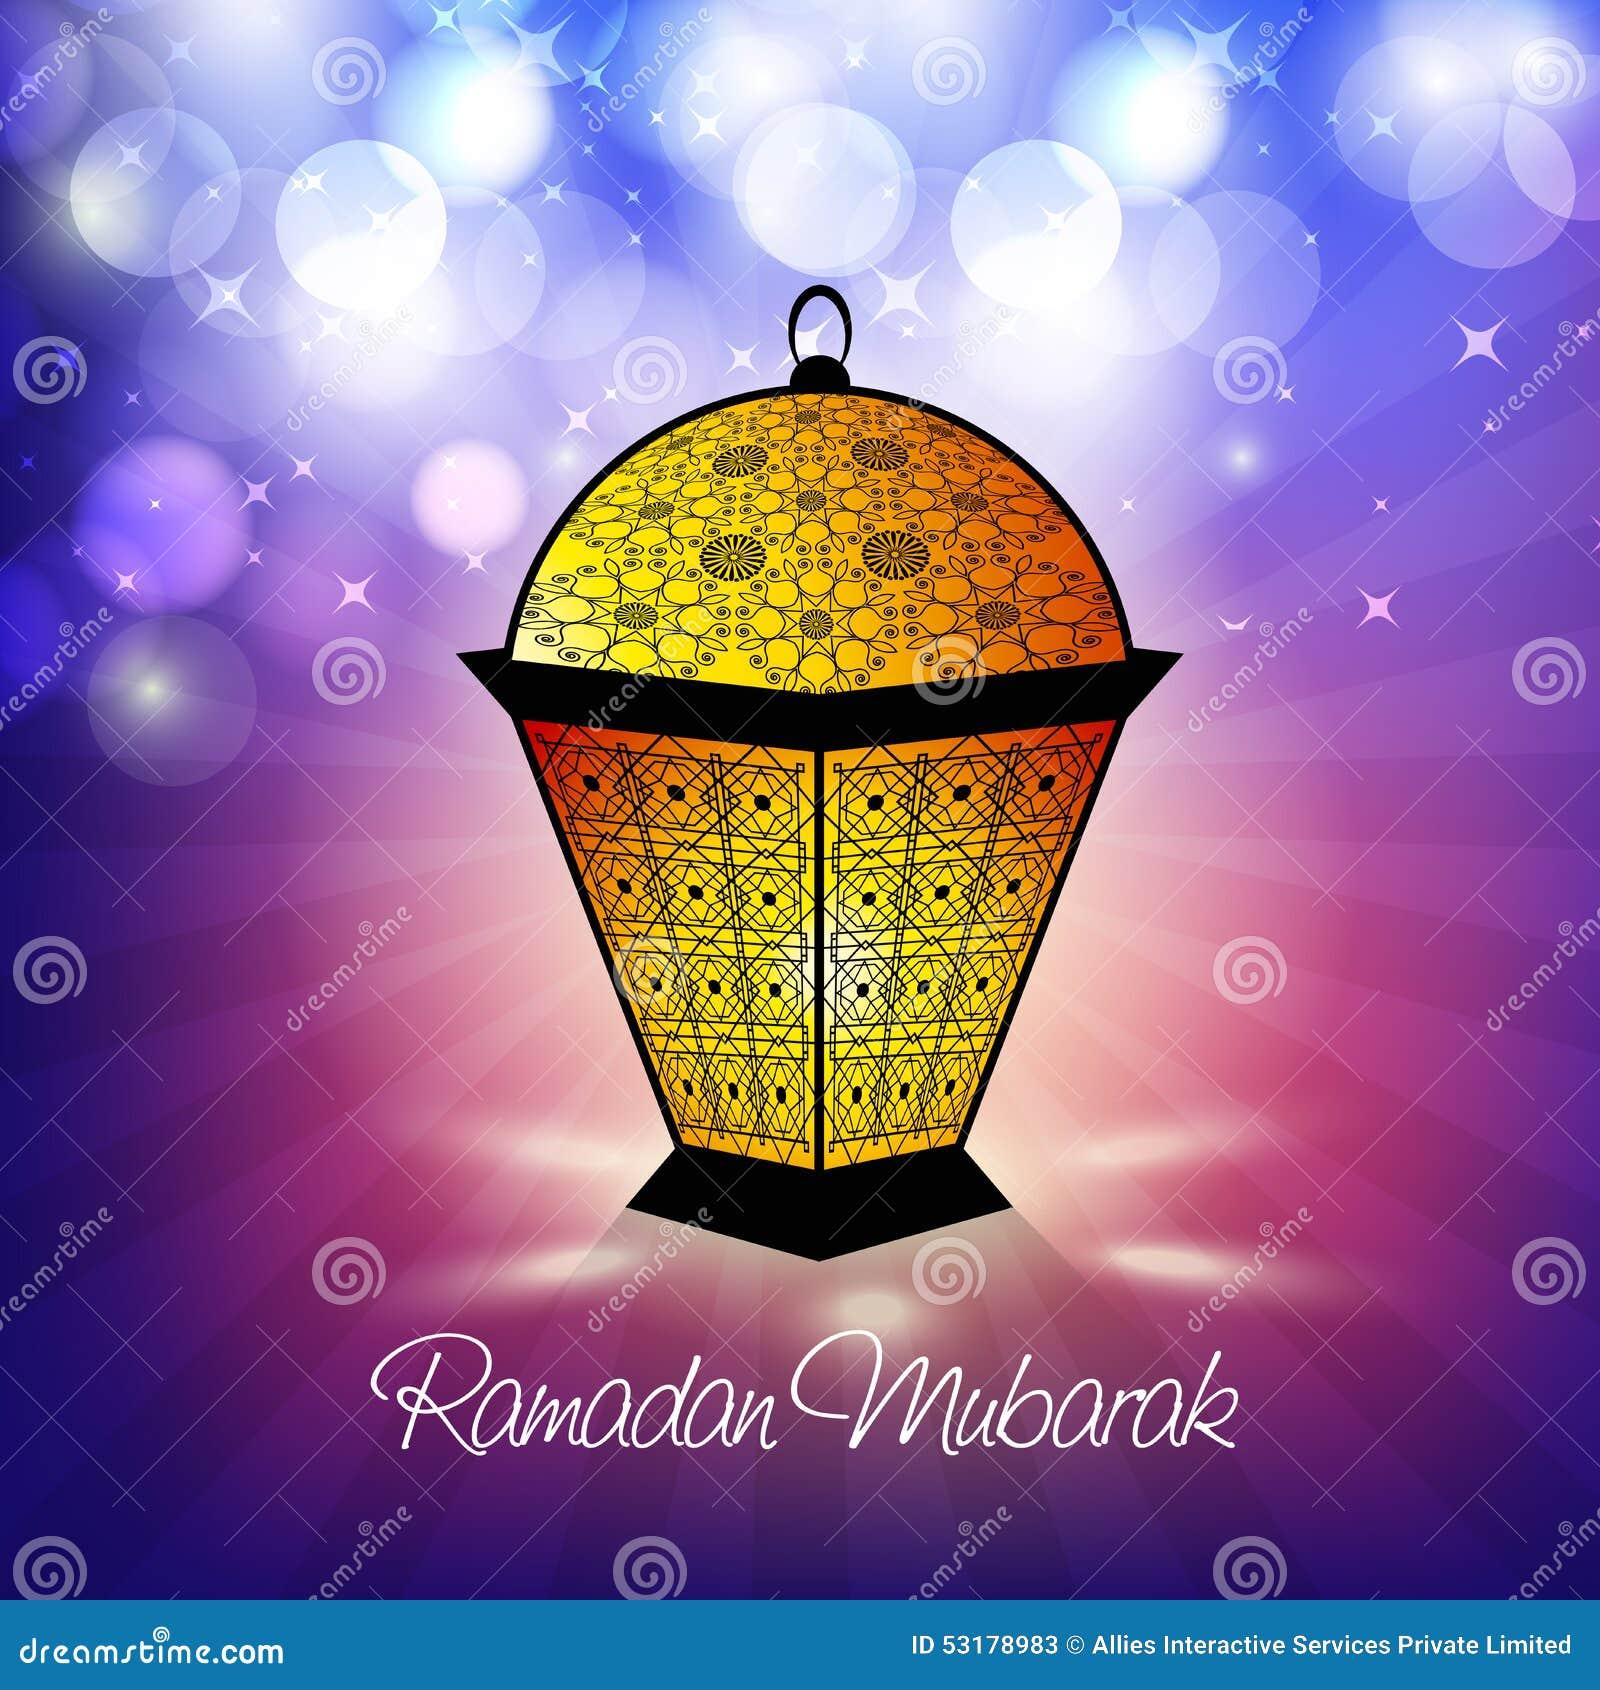 Ramadan Kareem Celebration With Traditional Arabic Lamp. Stock ... for Traditional Arabic Lamp  568zmd